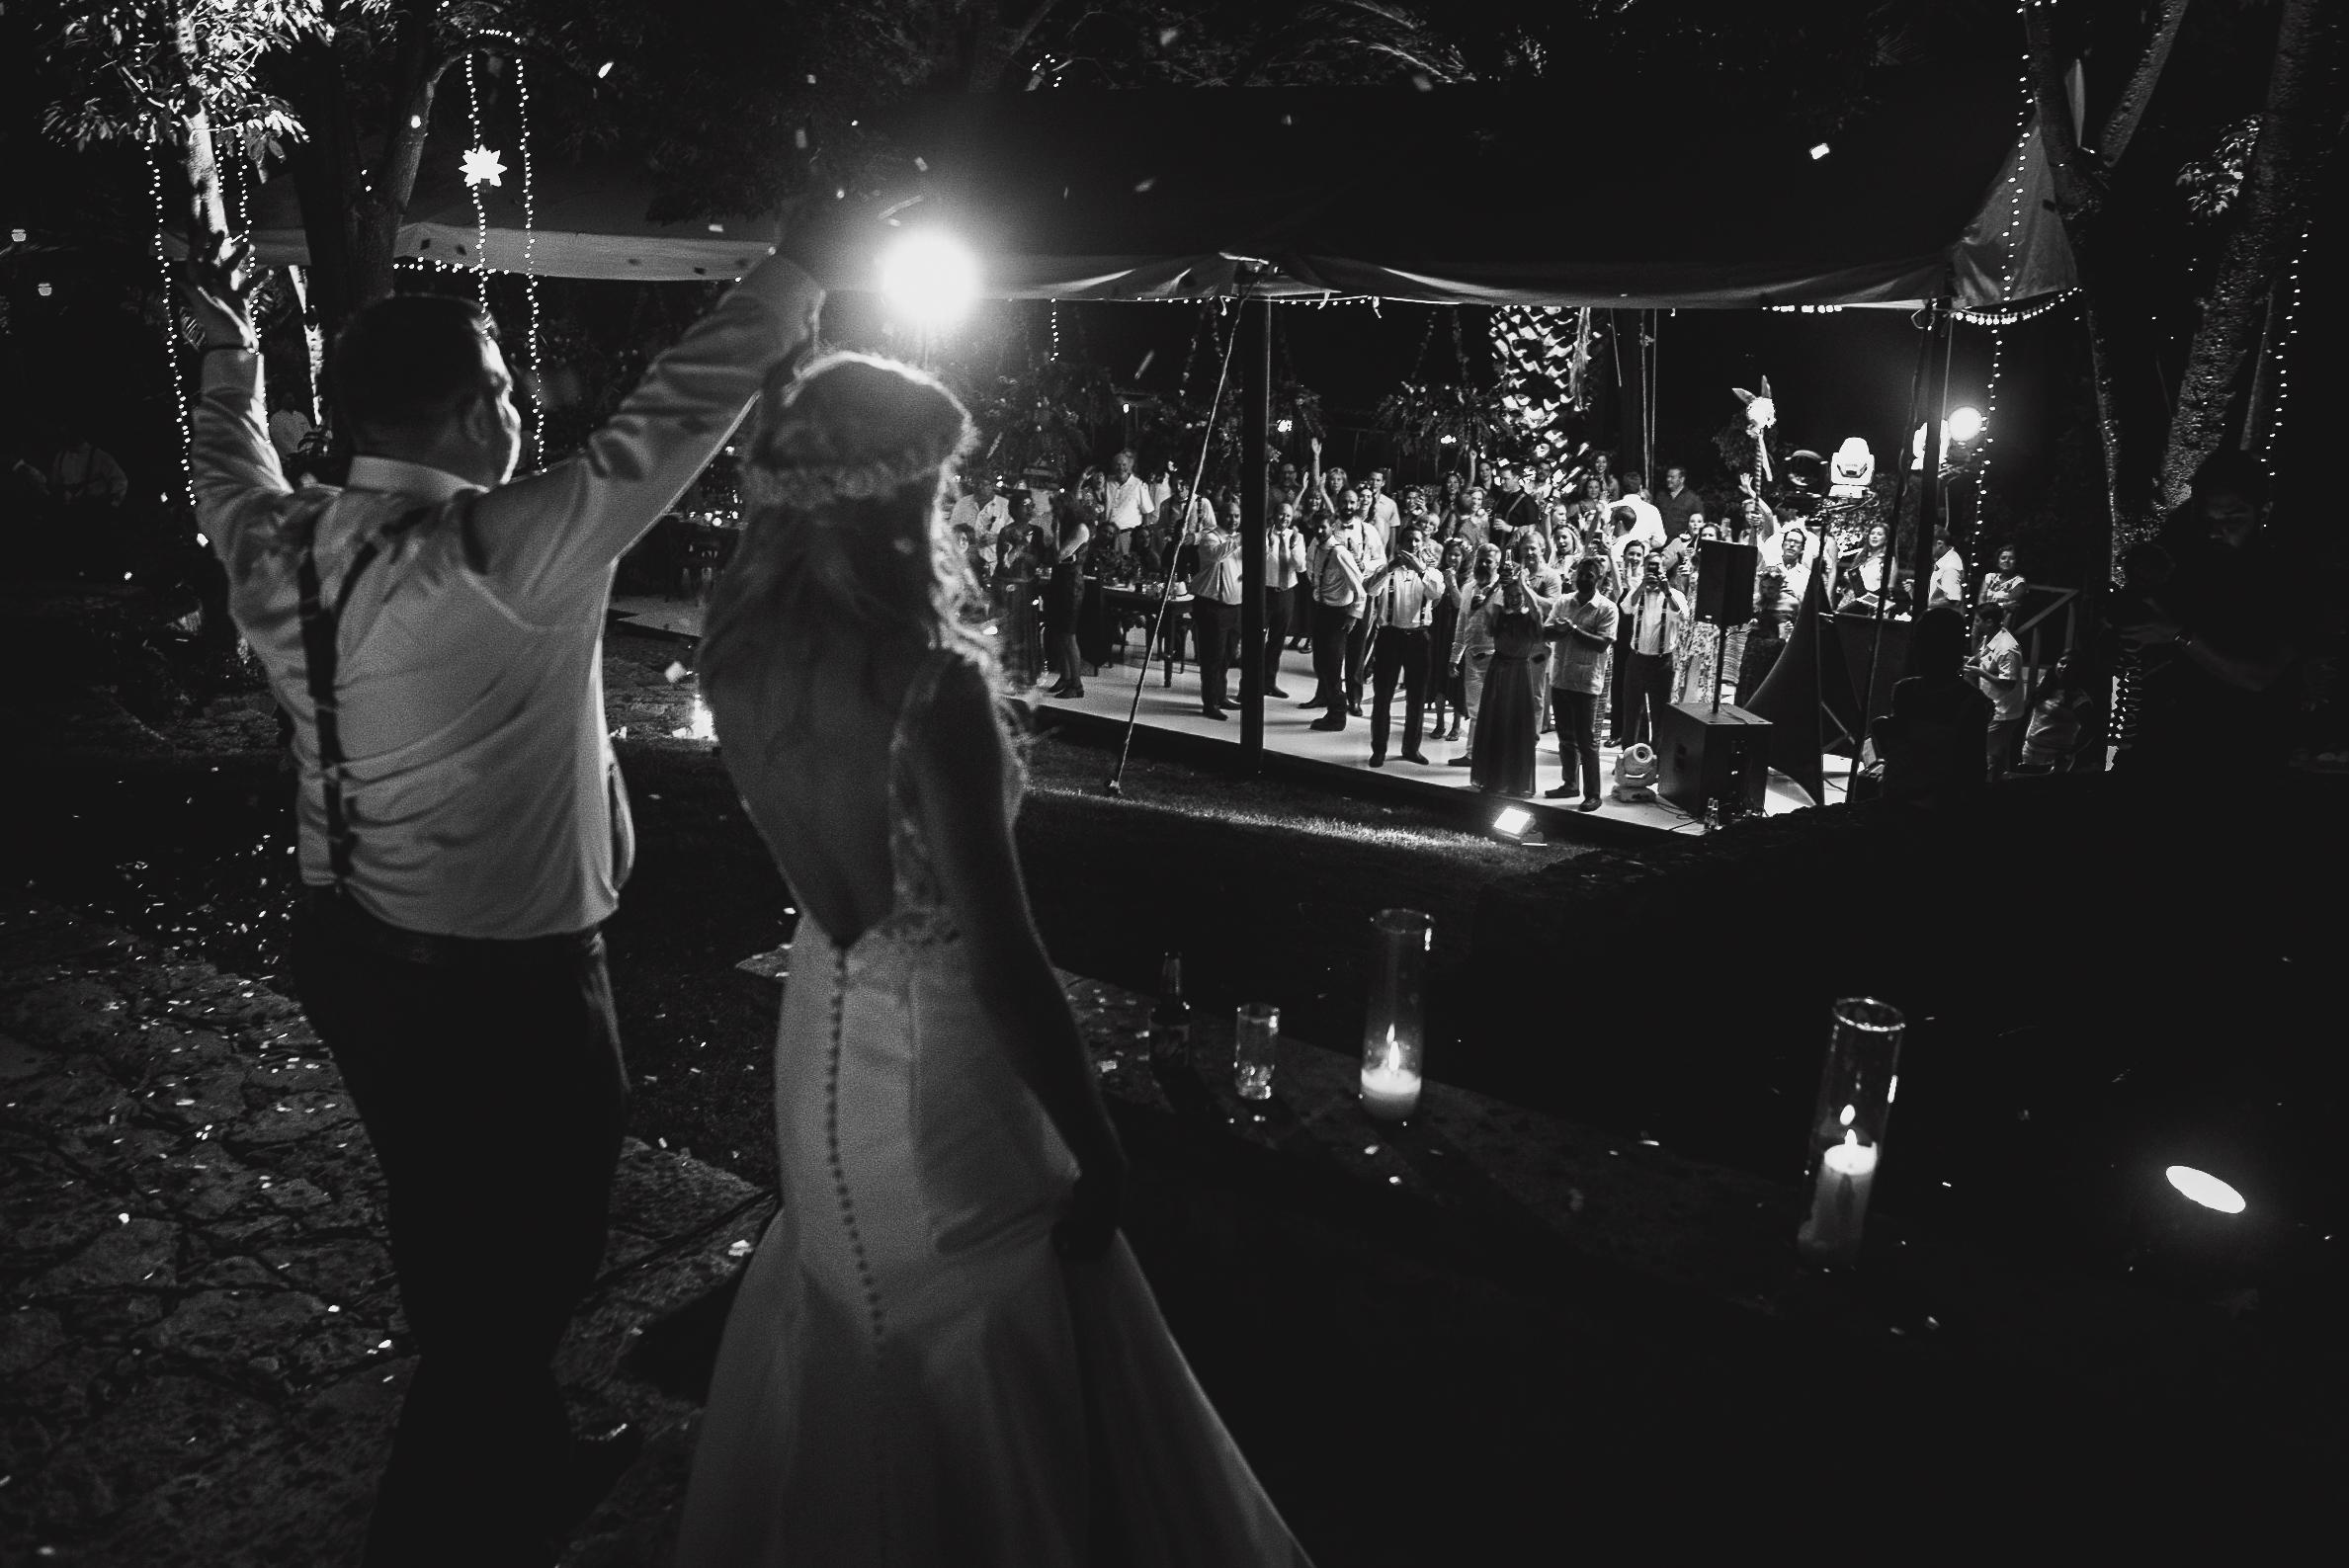 casa_chorro_wedding_san_miguel_de_allende_chio_garcia_photographer (33).jpg